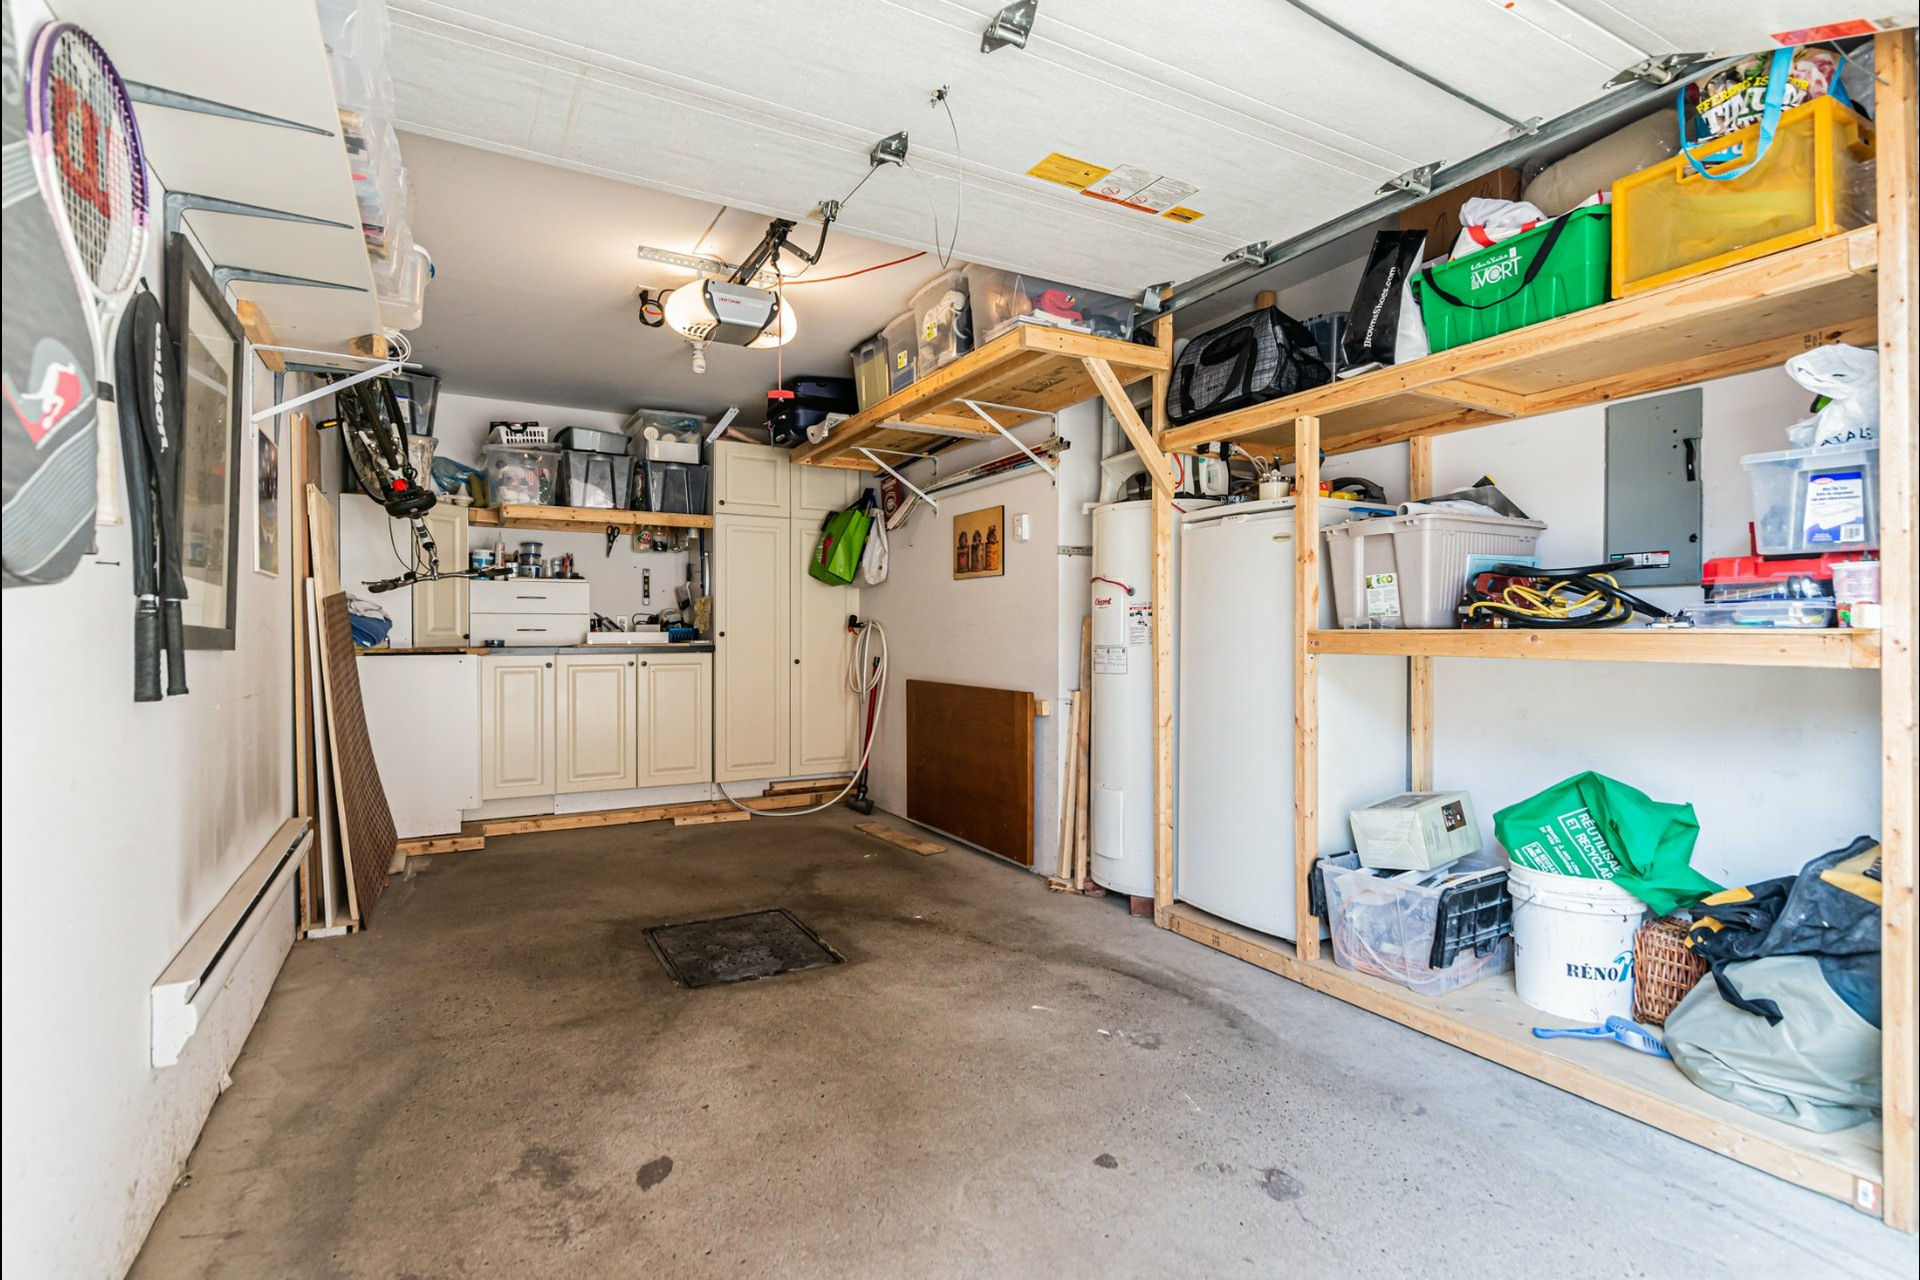 image 16 - Departamento En venta Saint-Laurent Montréal  - 4 habitaciones